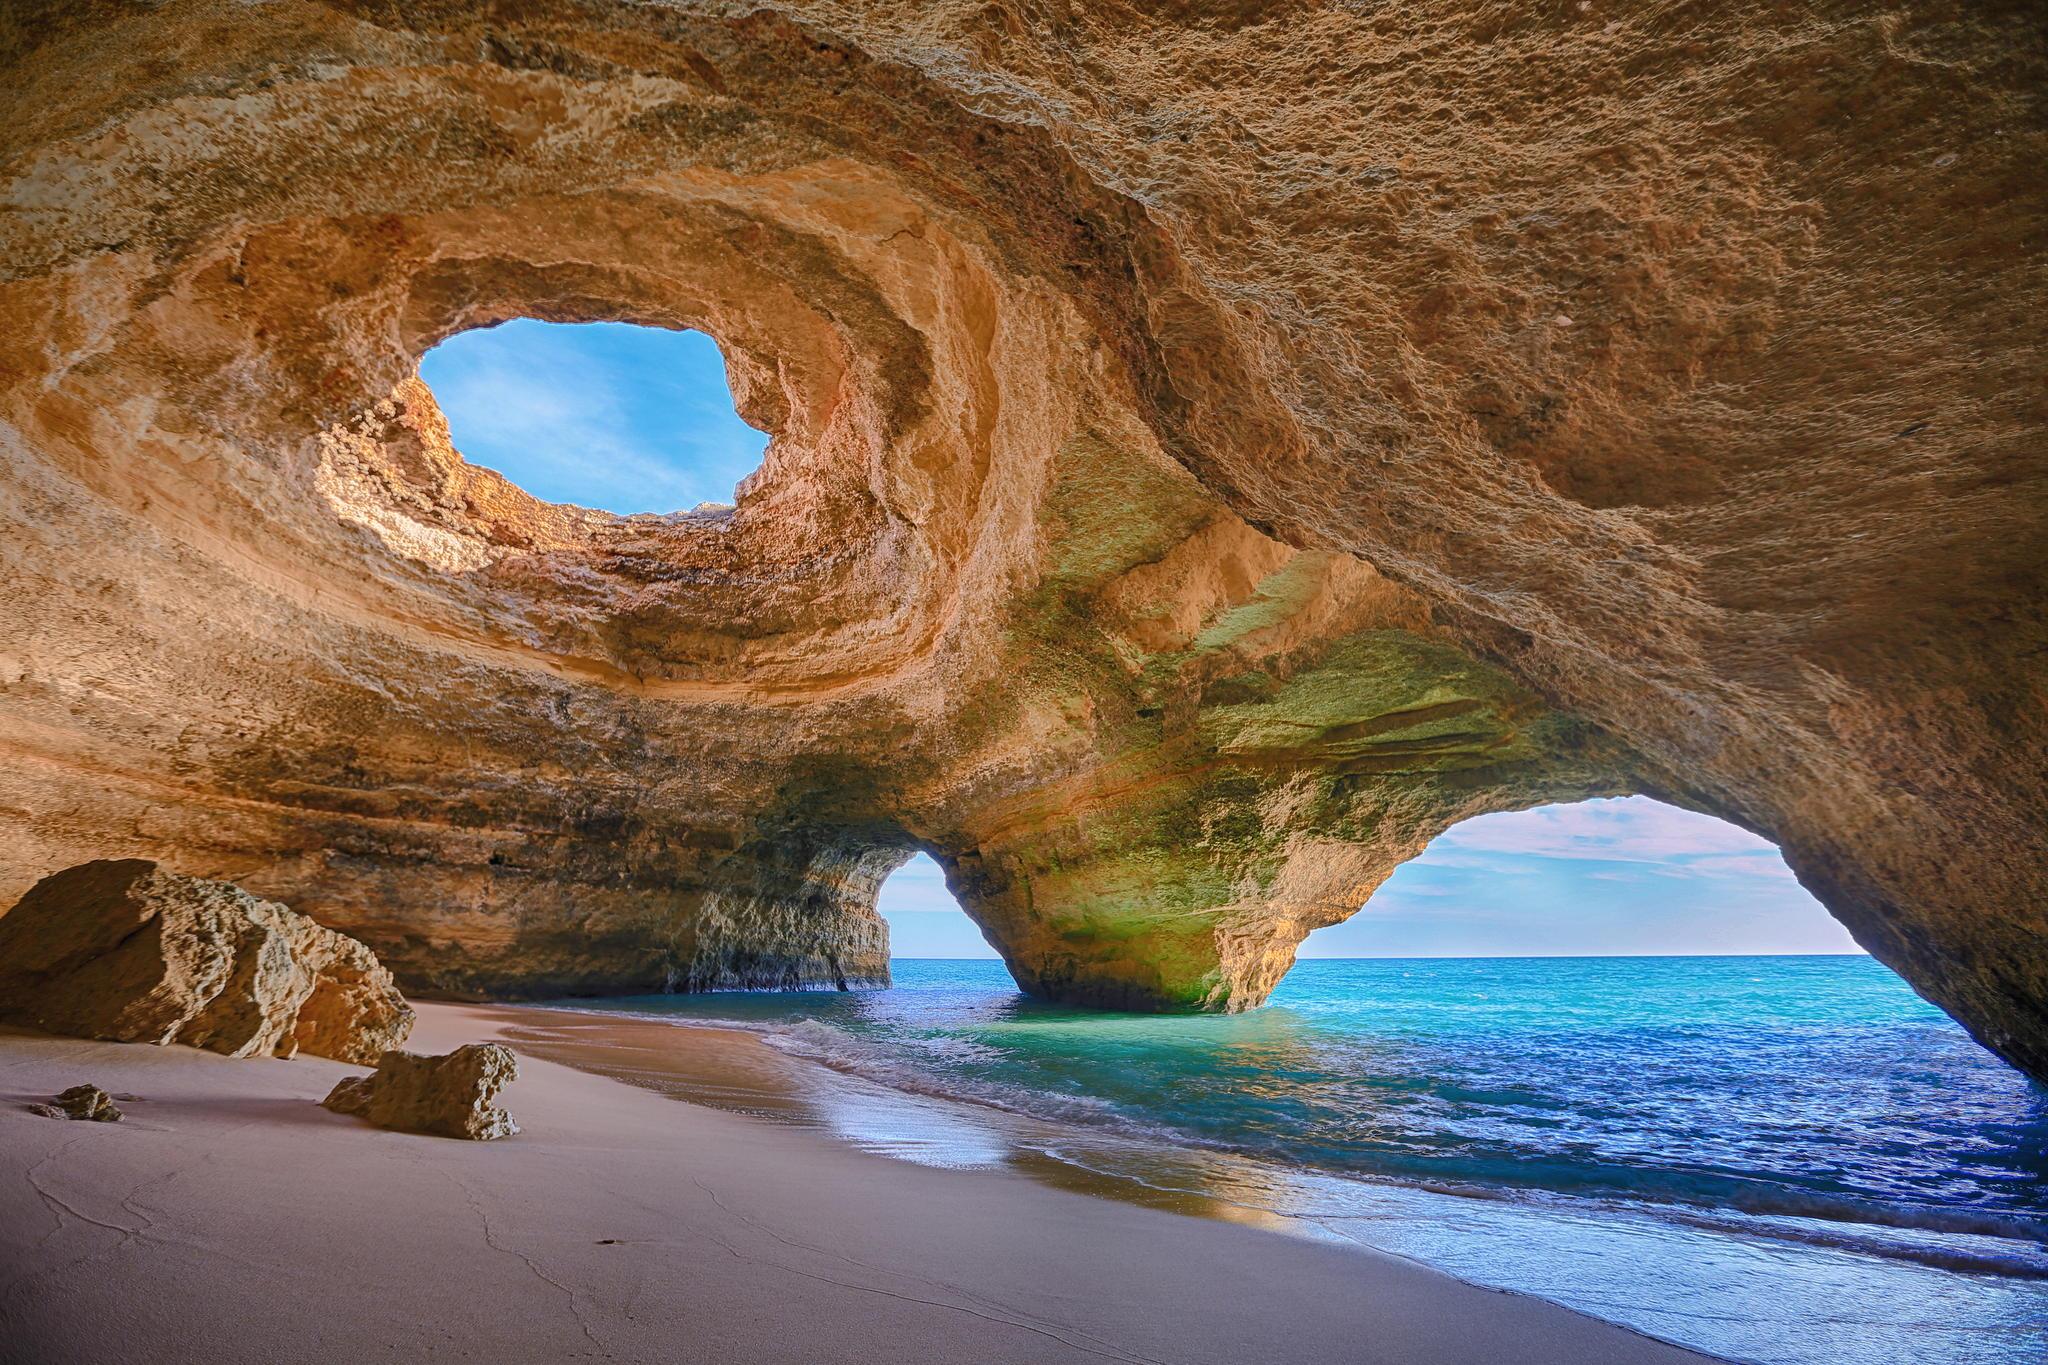 Grutas de Benagil - Lagos - Algarve - Portugal | foto: Bruno Carlos para commons.wikimedia.org